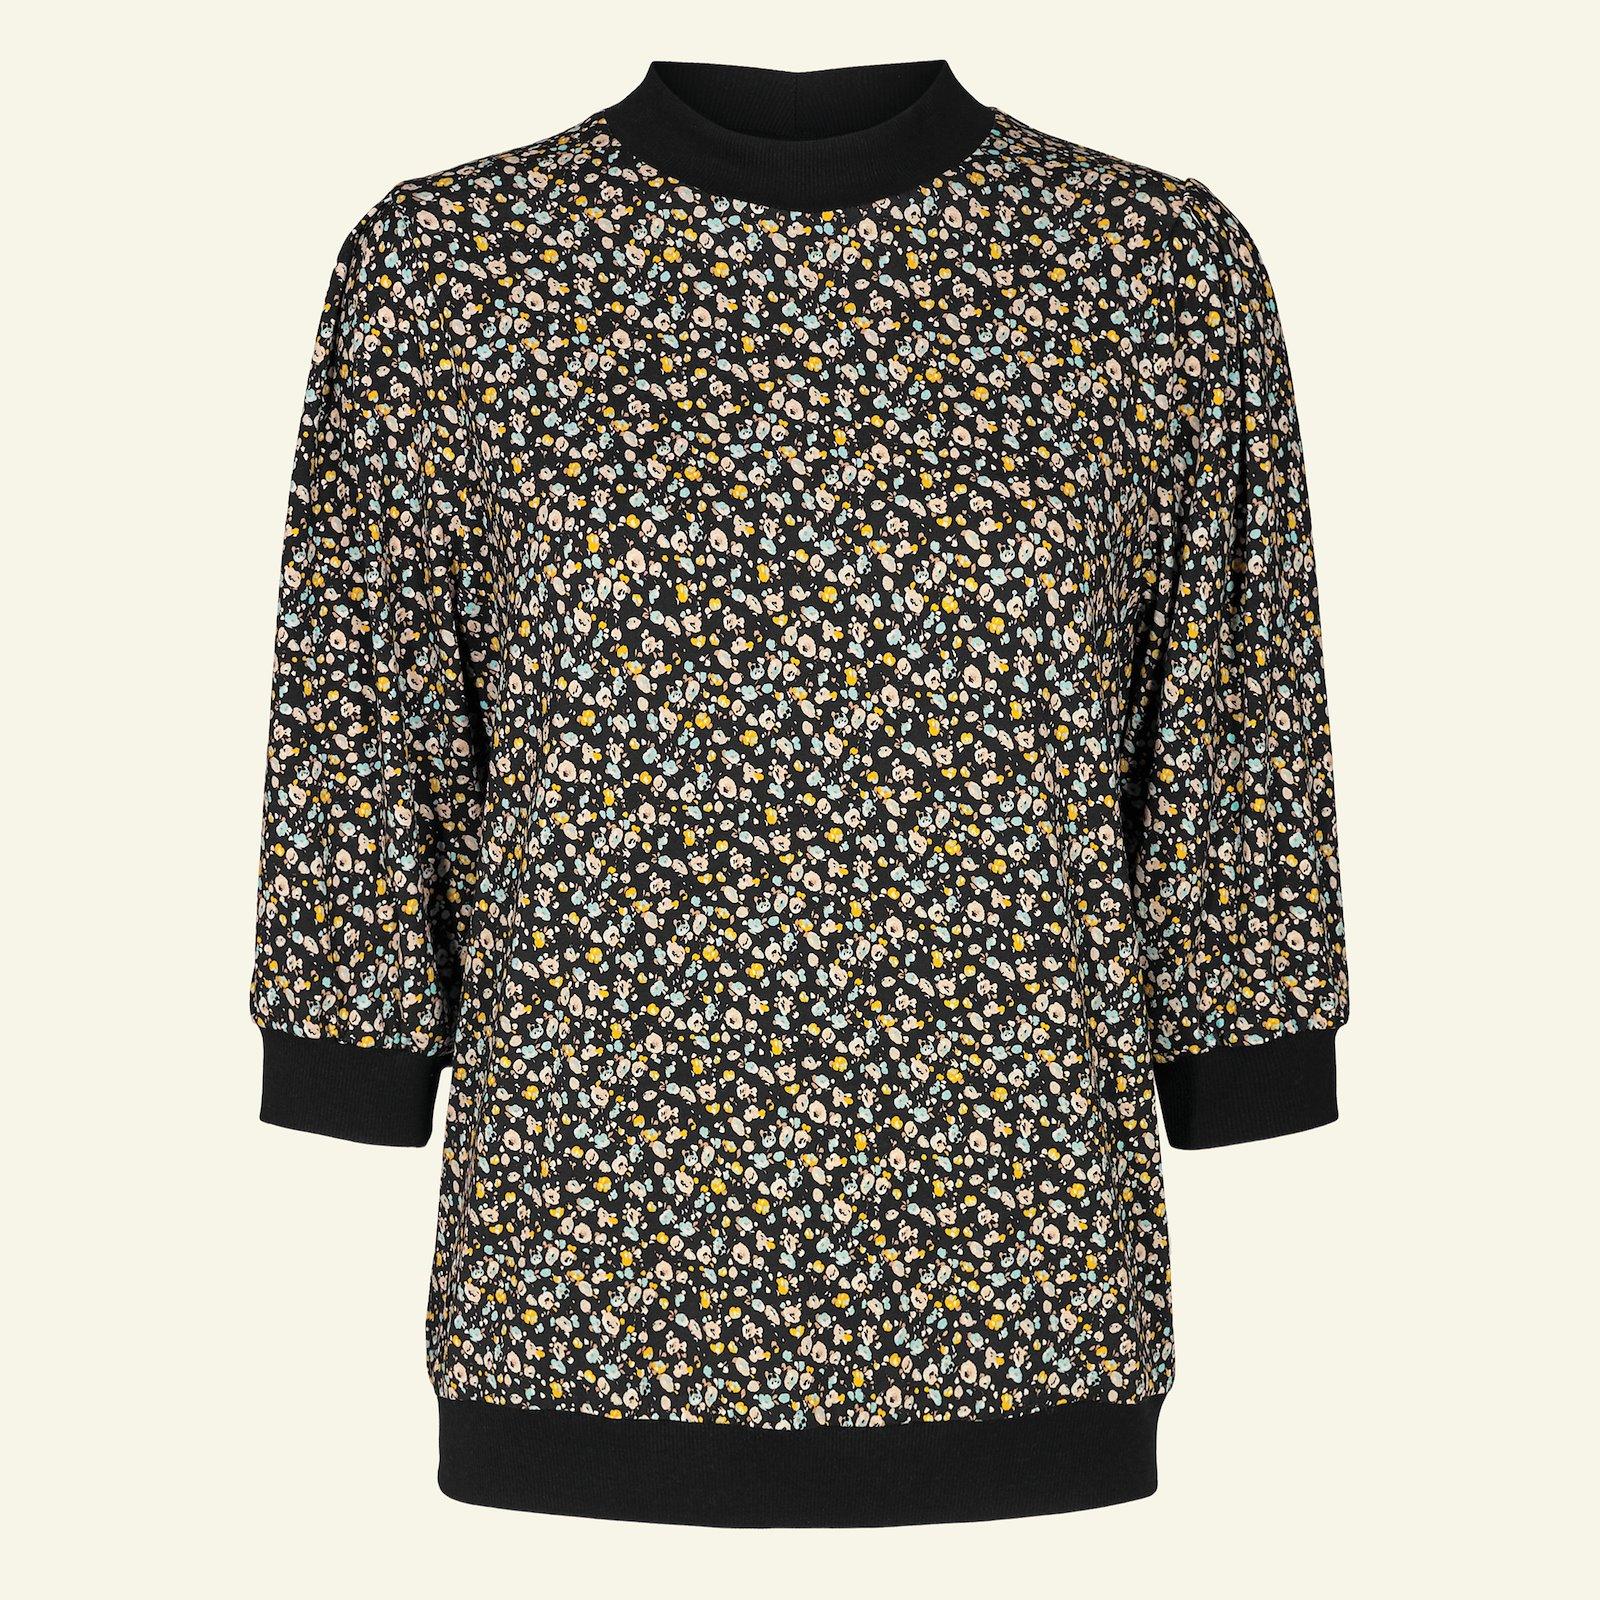 Sweatshirt with puff sleeves, S p22074_272618_272436_sskit